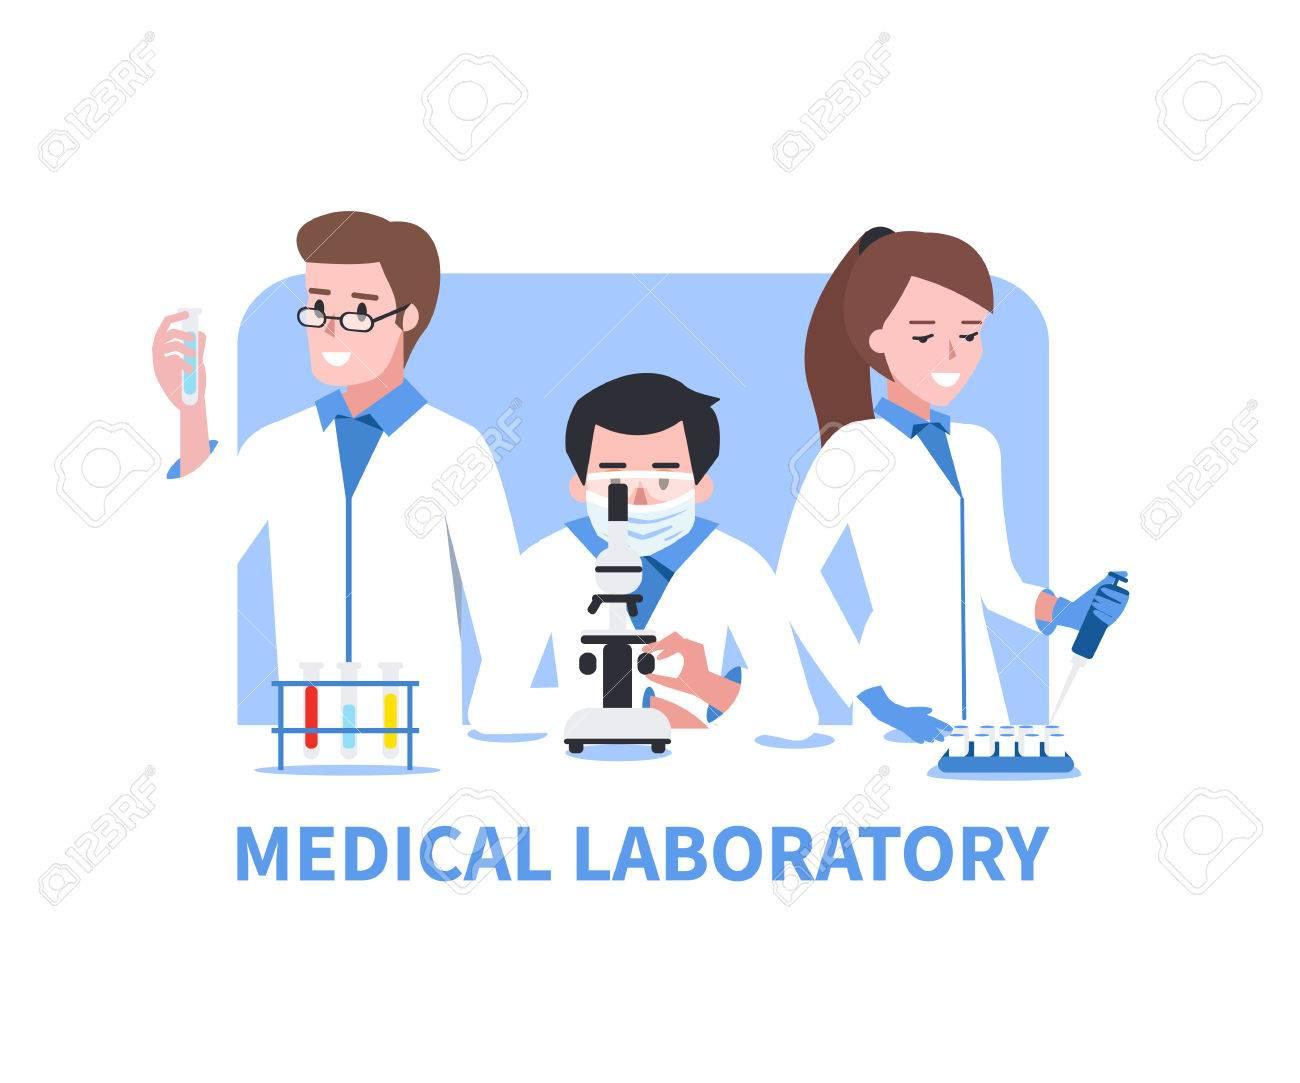 medical laboratory vector concept illustration chemistry scientists rh 123rf com Laboratory Clip Art Laboratory Design Color